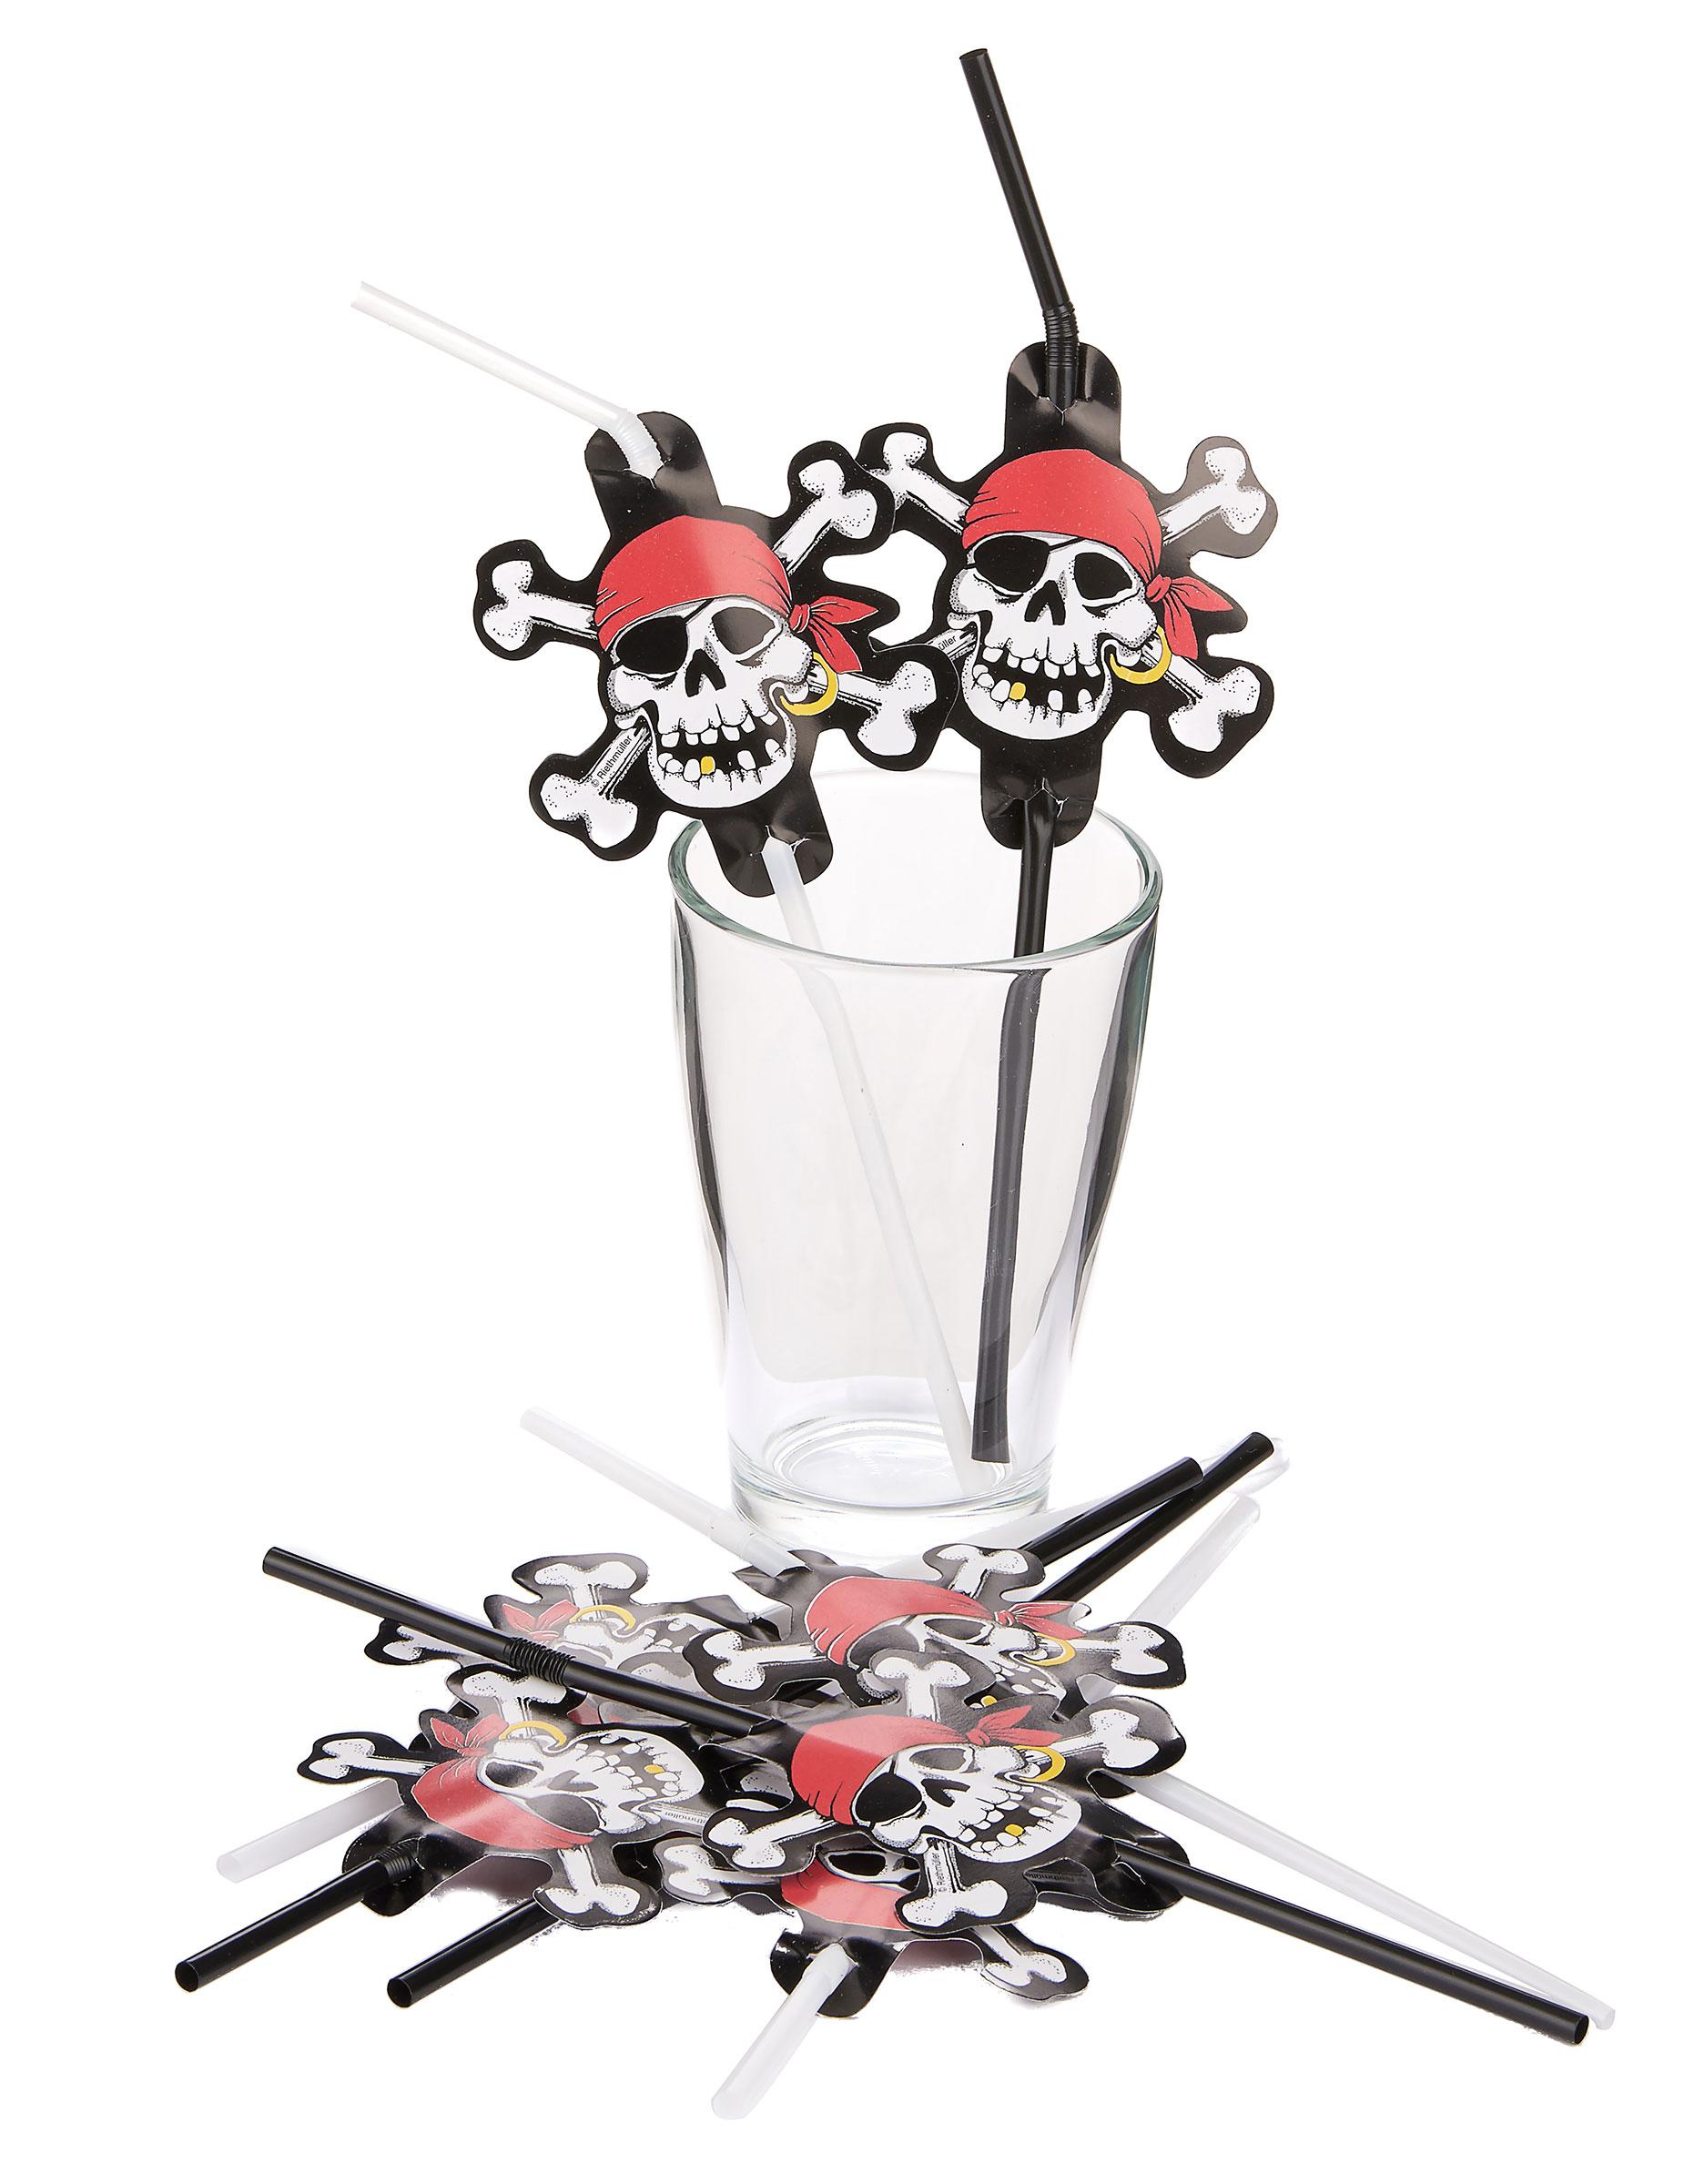 trinkhalme totenkopf skull piratenparty deko 8 st ck rot schwarz weiss 24cm g nstige faschings. Black Bedroom Furniture Sets. Home Design Ideas